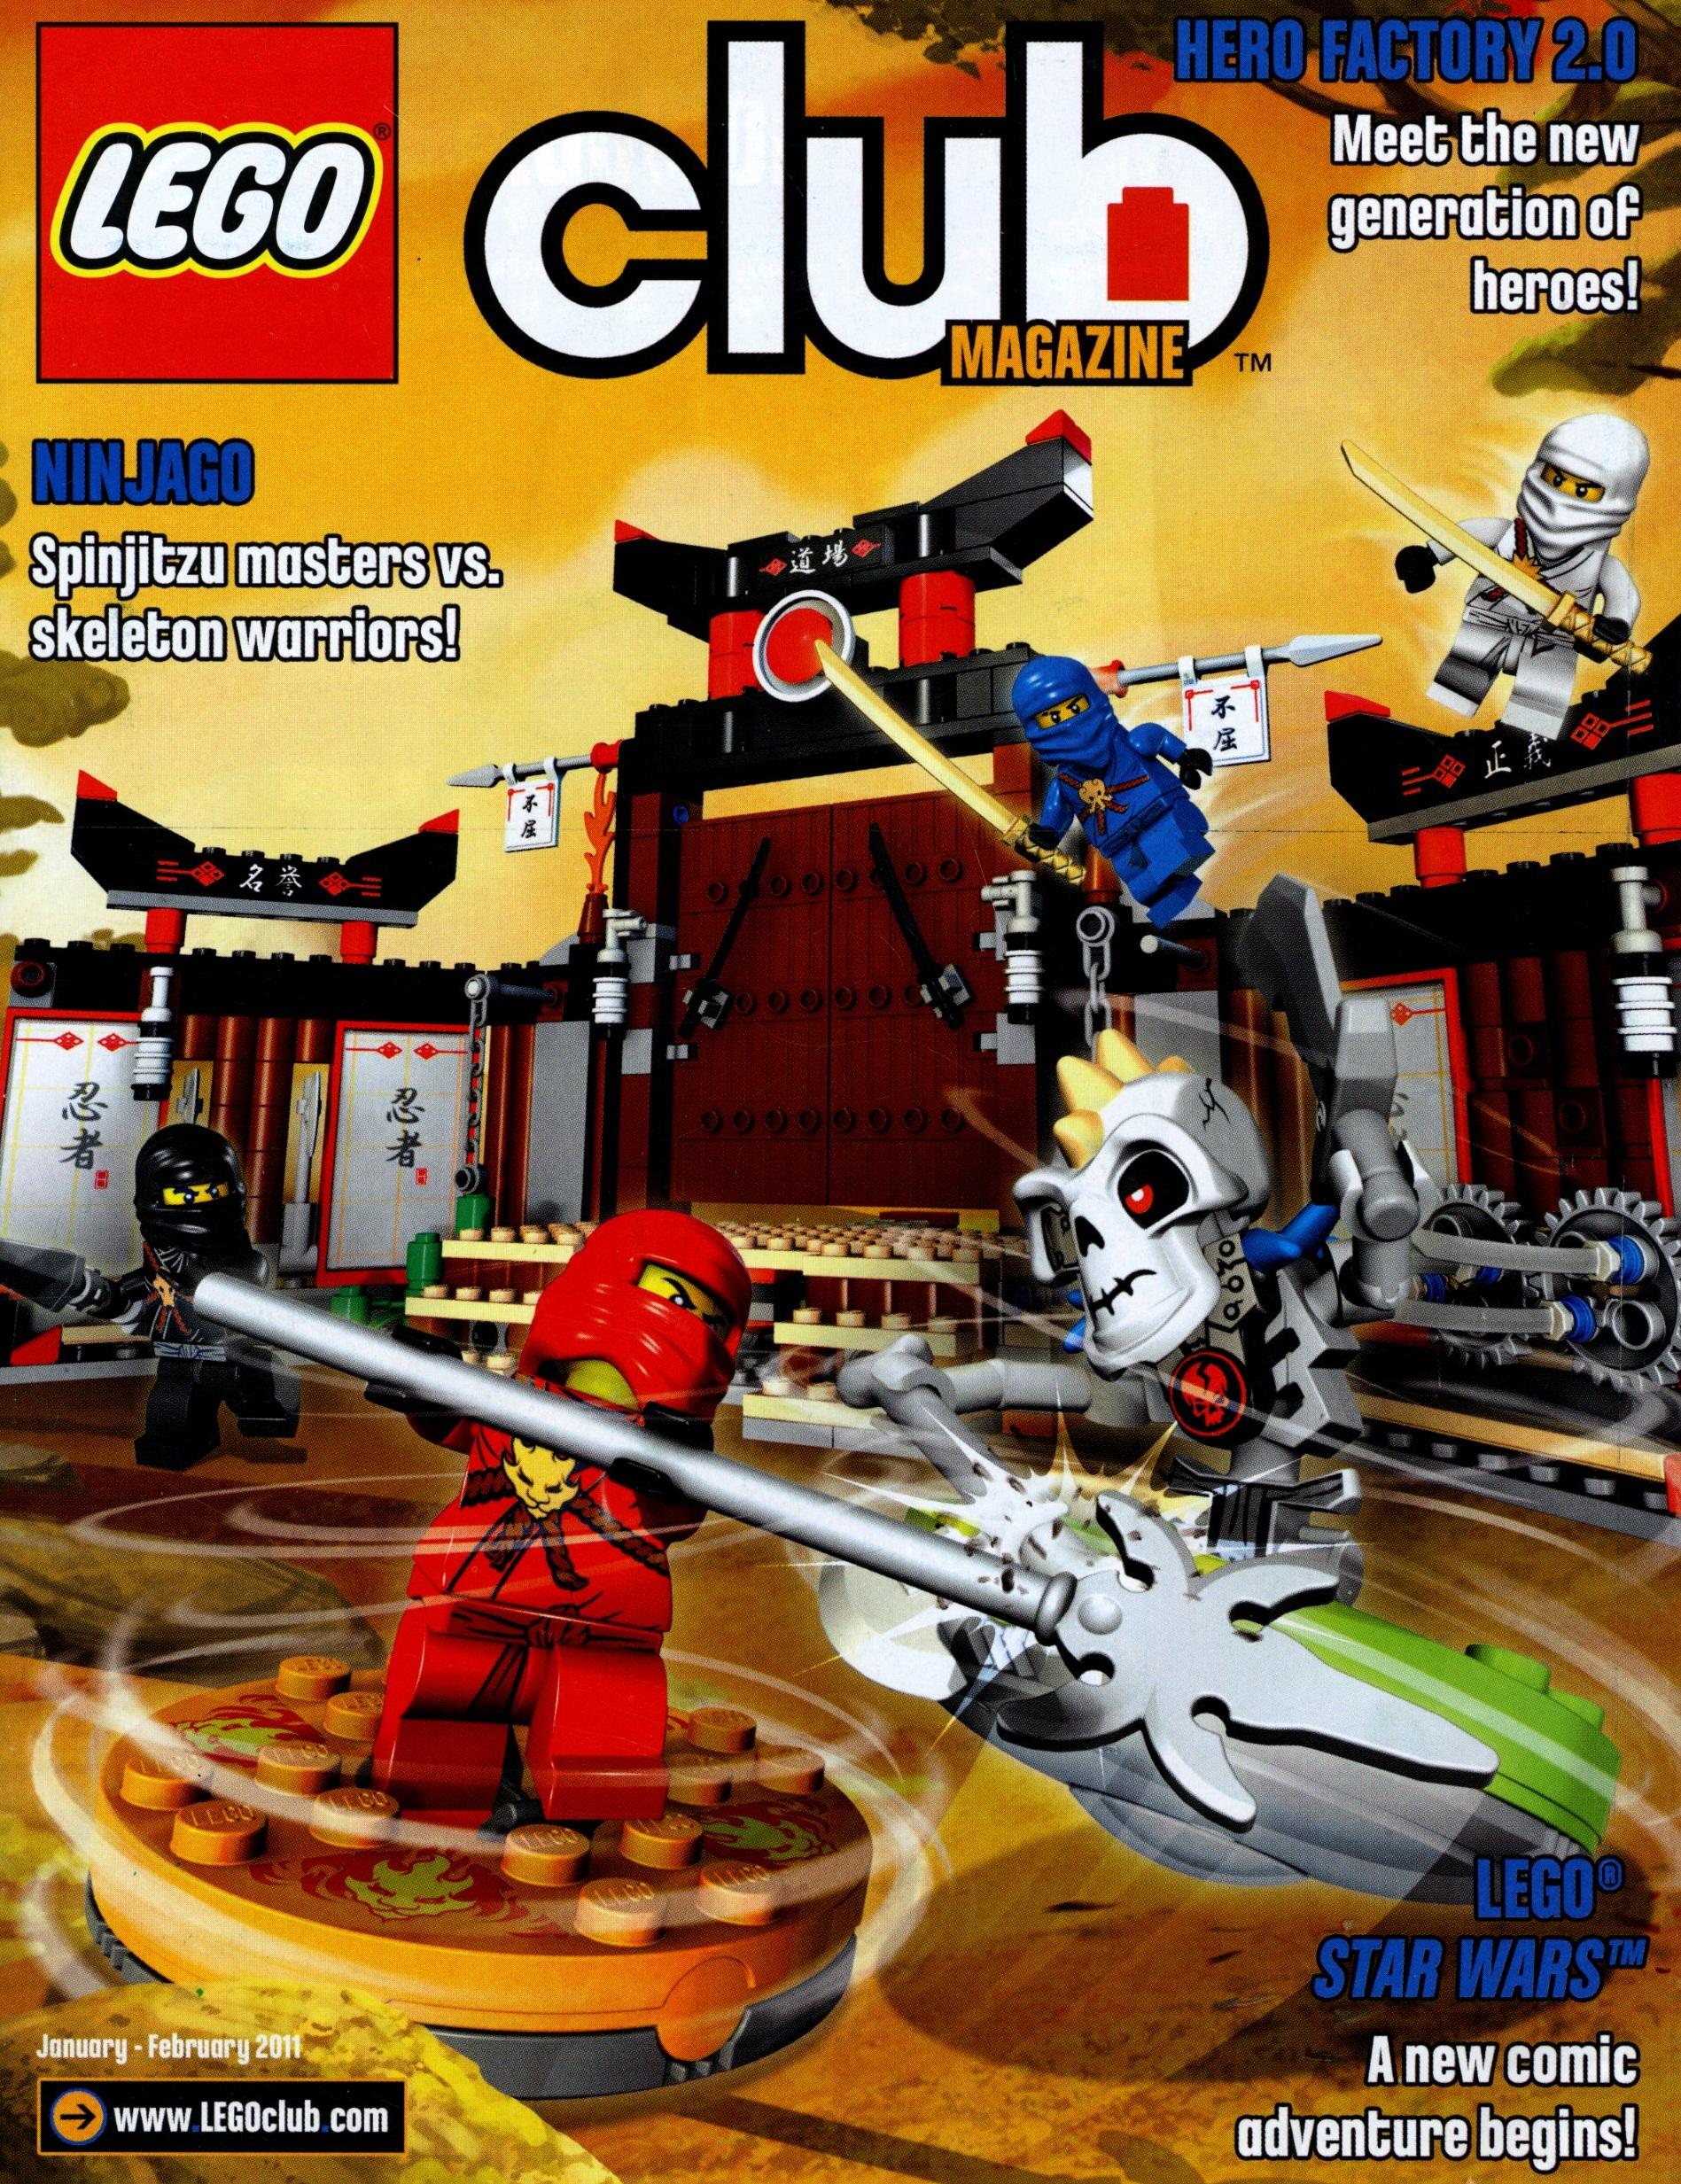 http://contentmarketinginstitute.com/wp-content/uploads/2011/01/lego-ninjago-magazine.jpg